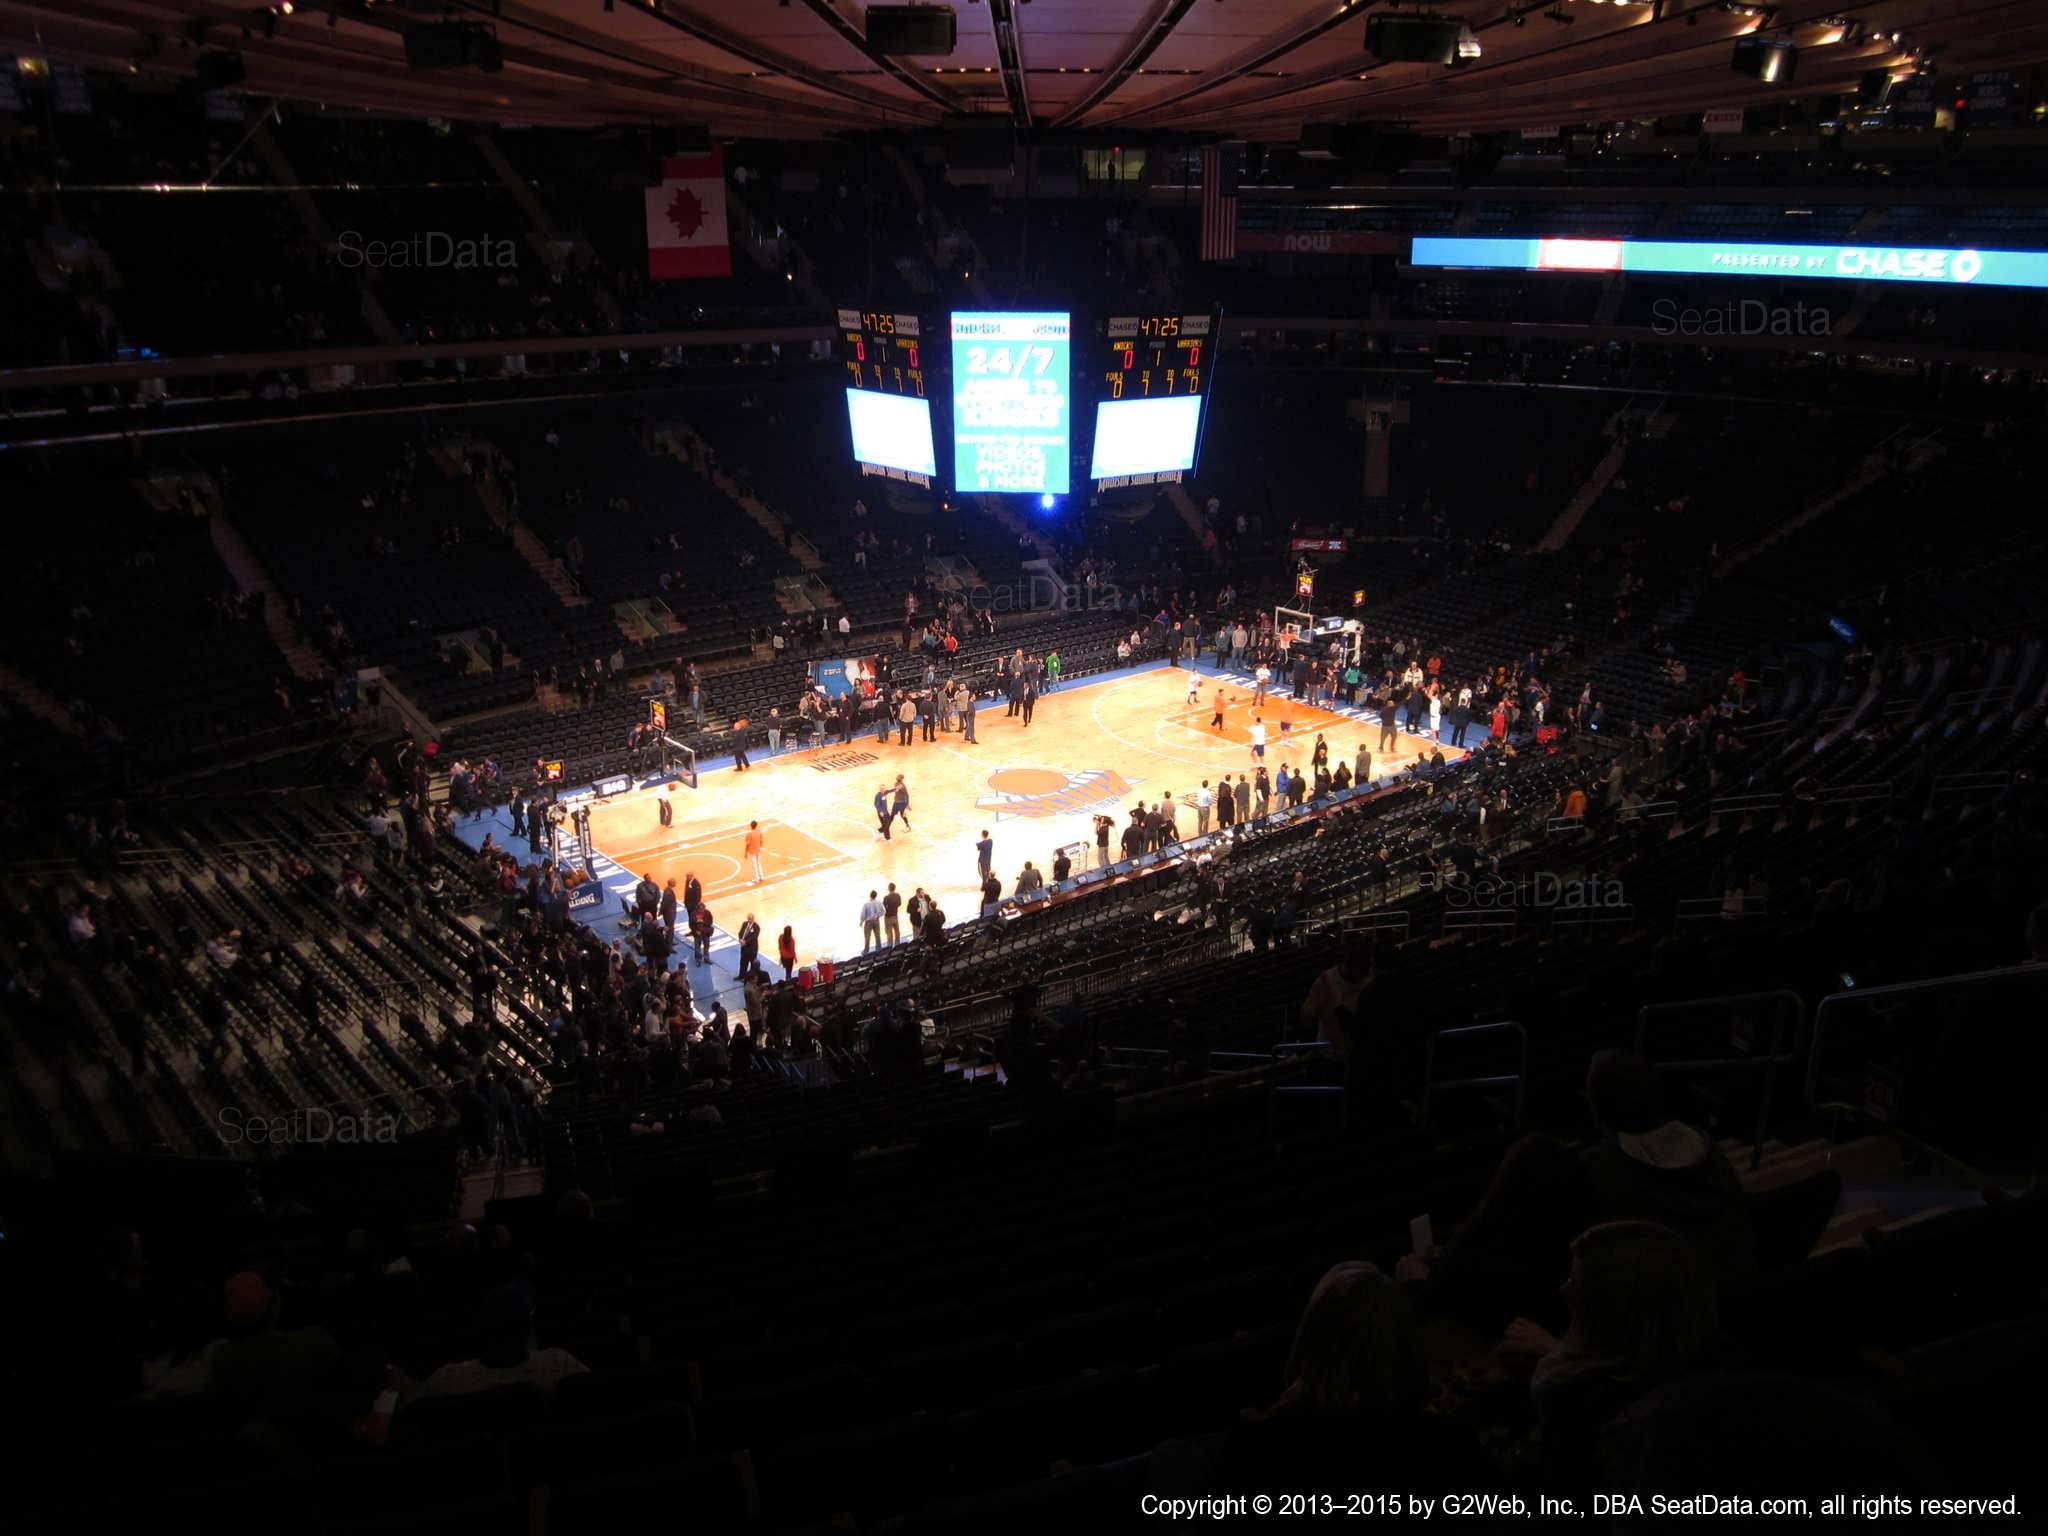 New york knicks madison square garden section 208 - Bruno mars tickets madison square garden ...